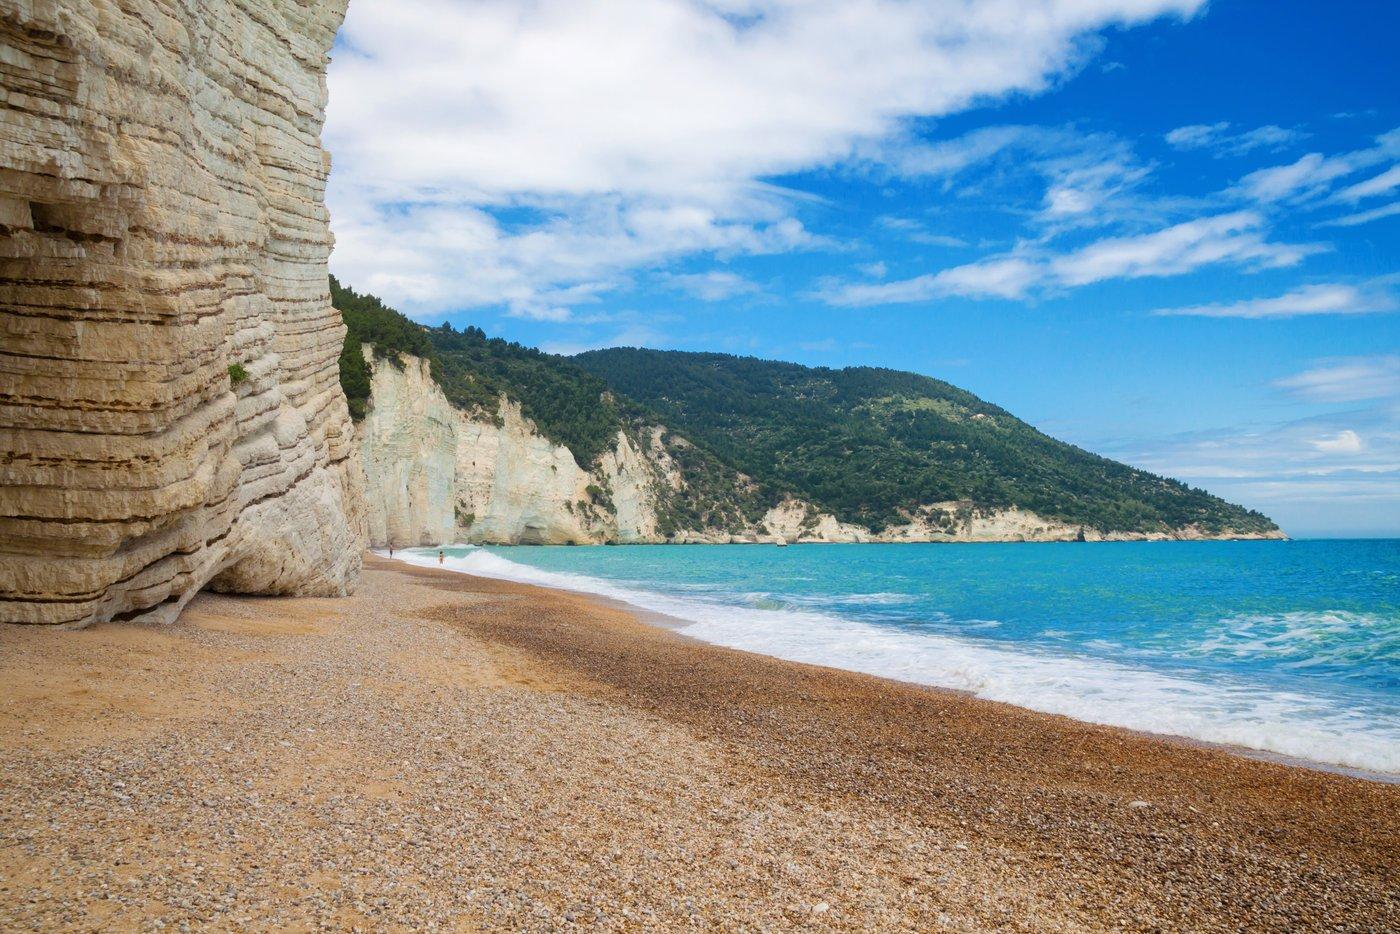 Photo Tour of East Coast Italy 46